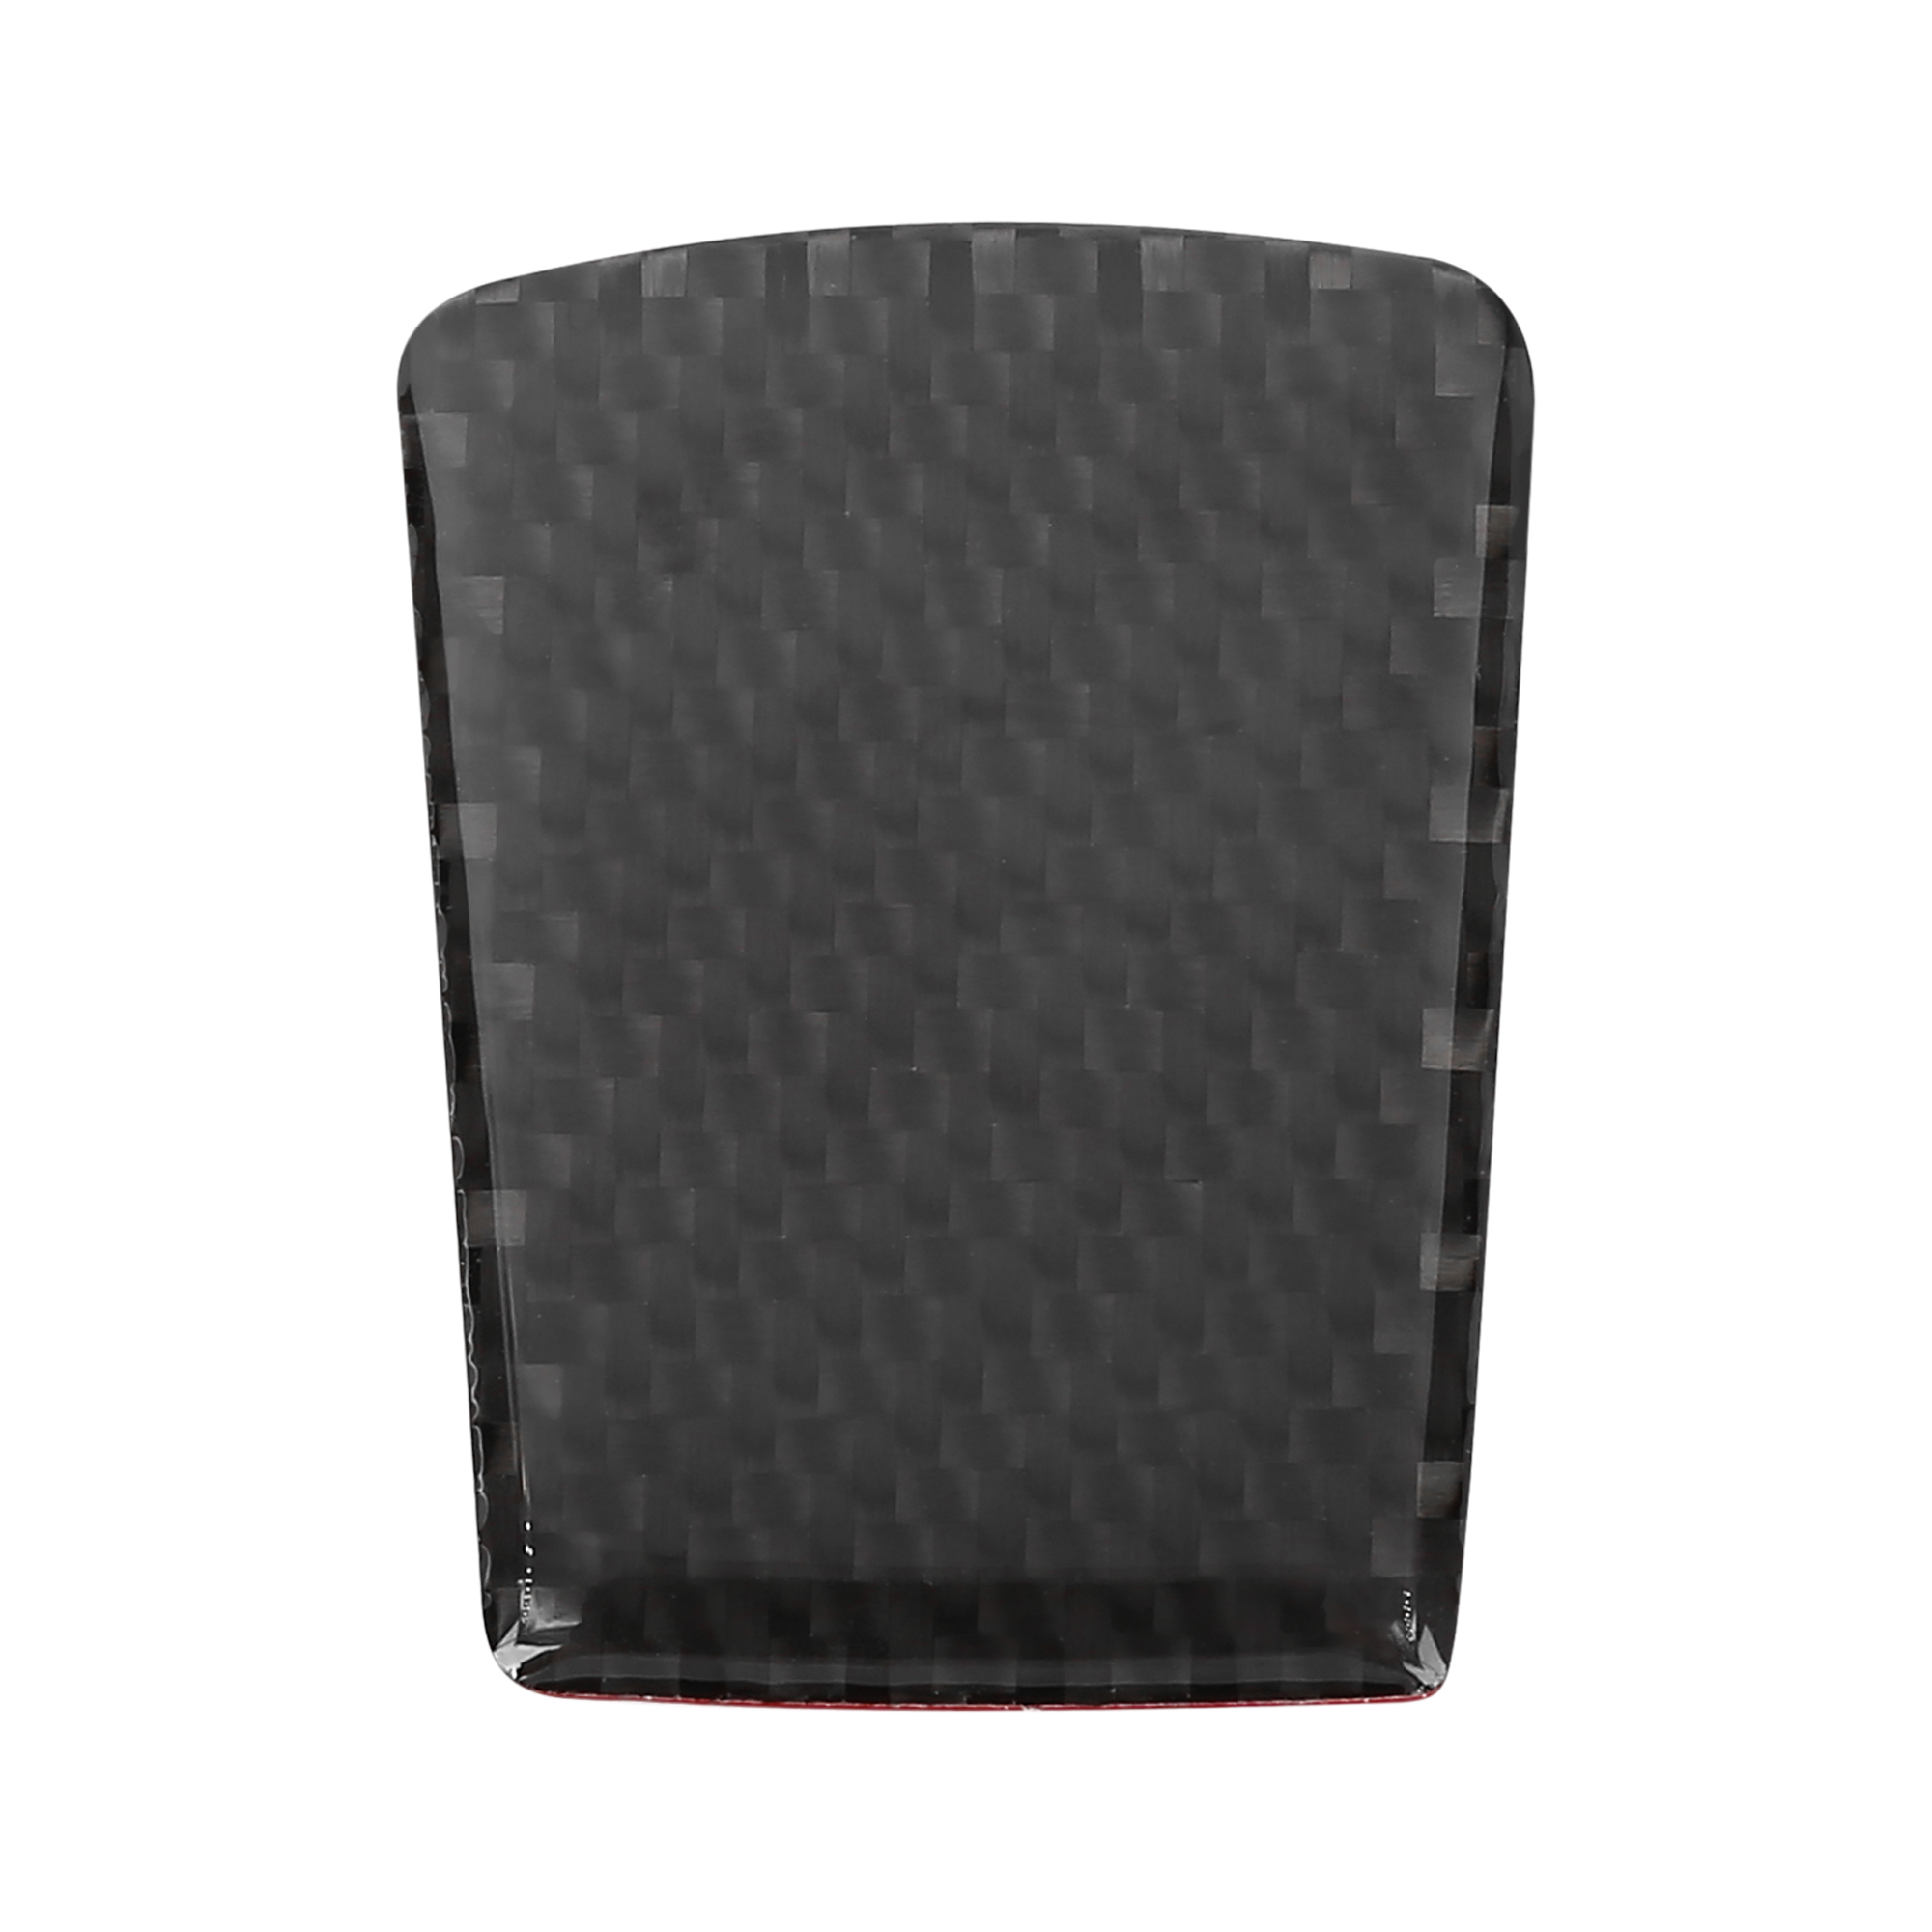 Car Vehicle Steering Wheel Trim Cover Carbon Fiber Pattern Black for Subaru